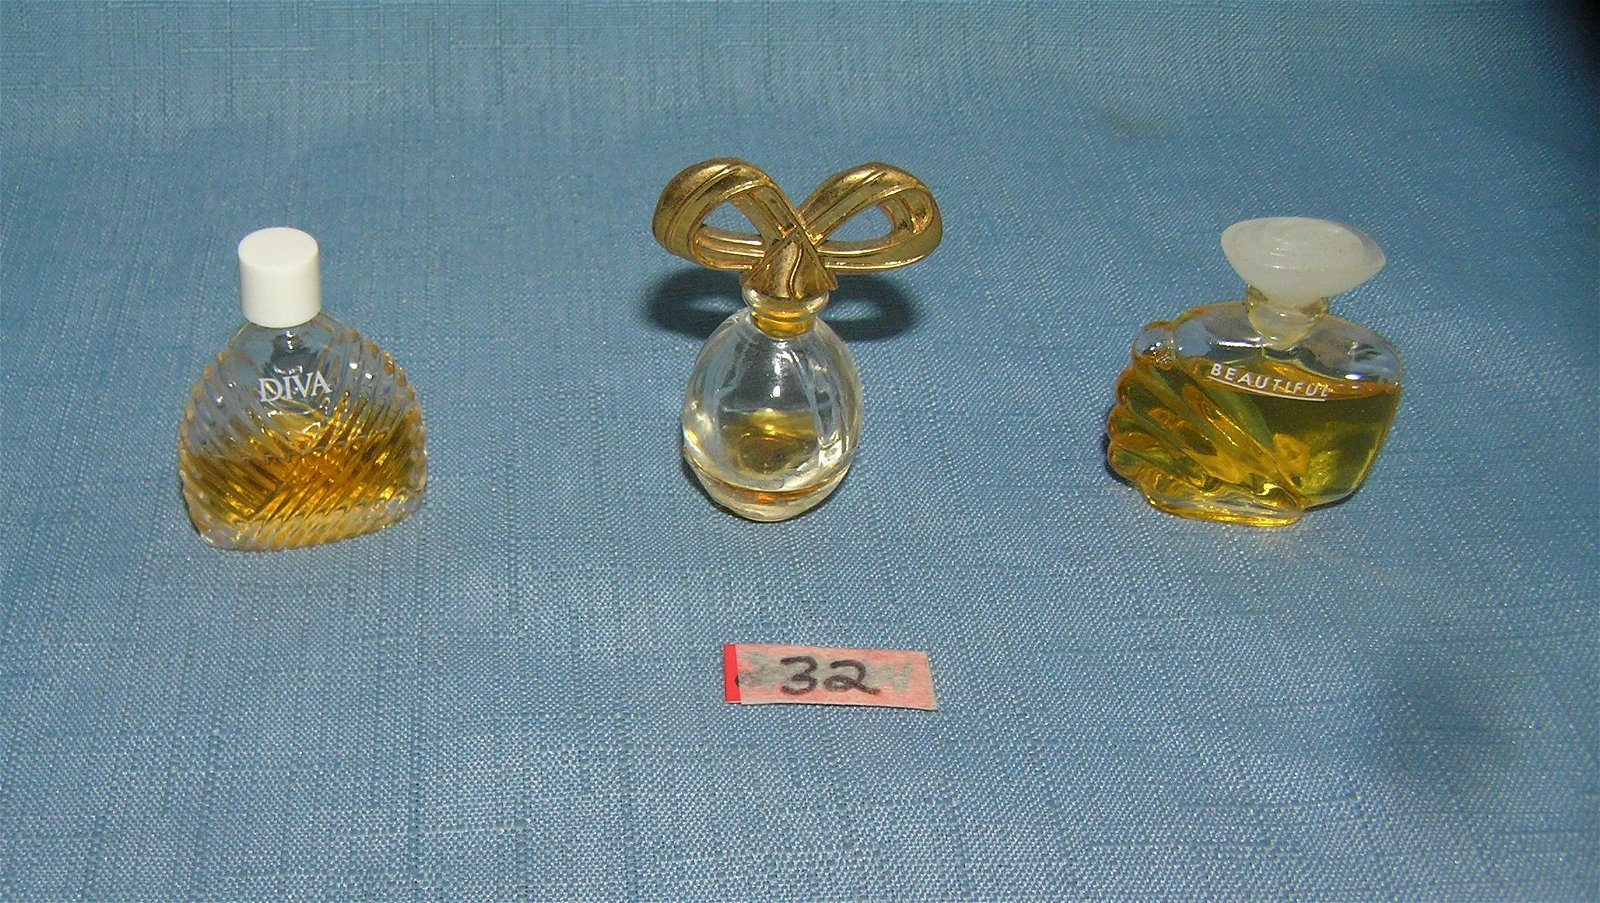 Group of miniature perfume bottles